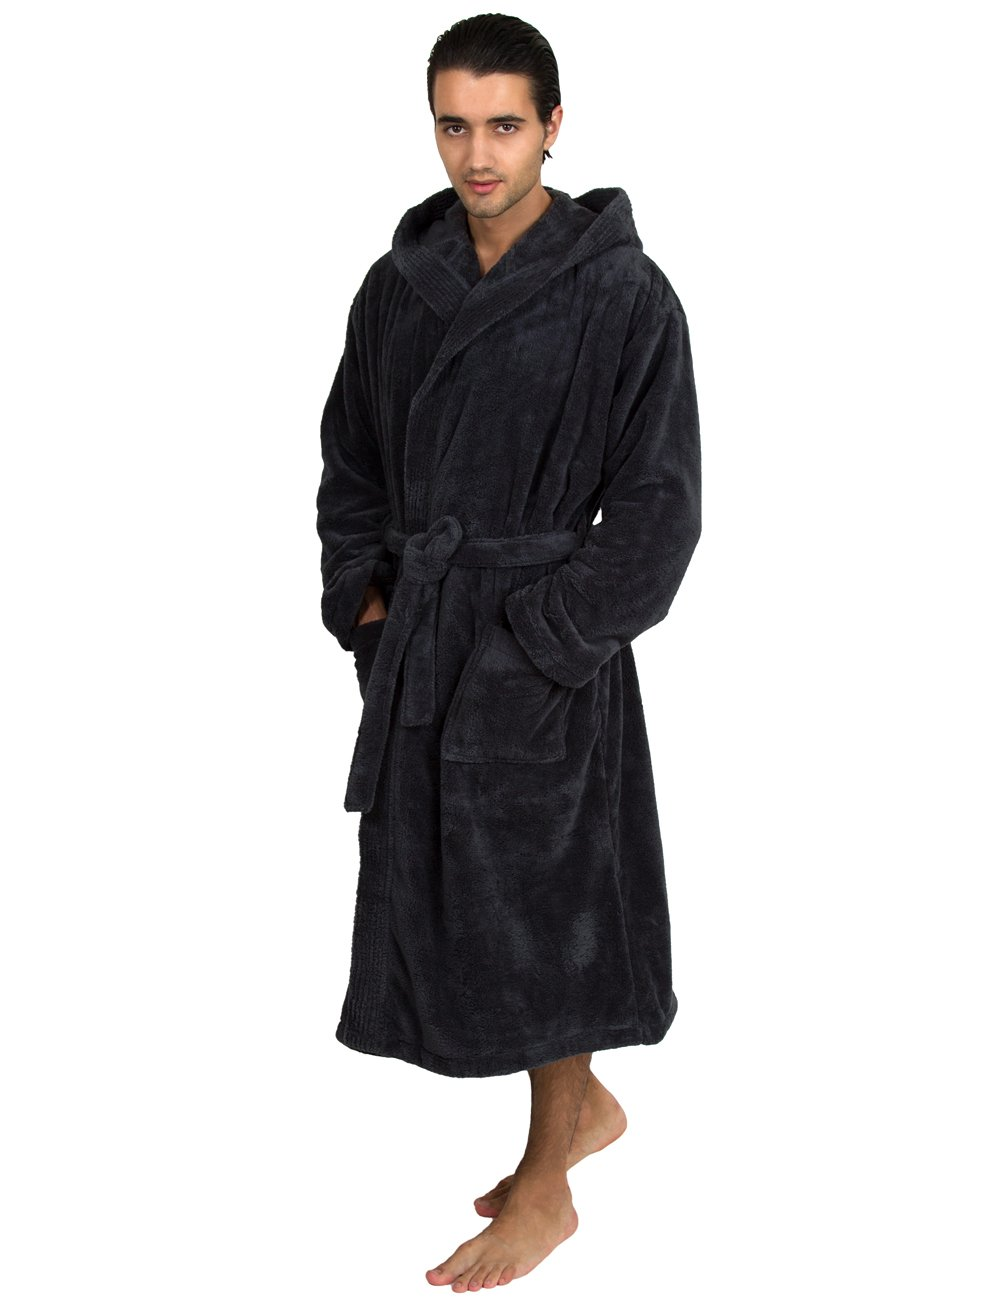 TowelSelections Men's Robe, Plush Fleece Hooded Spa Bathrobe Small/Medium Charcoal